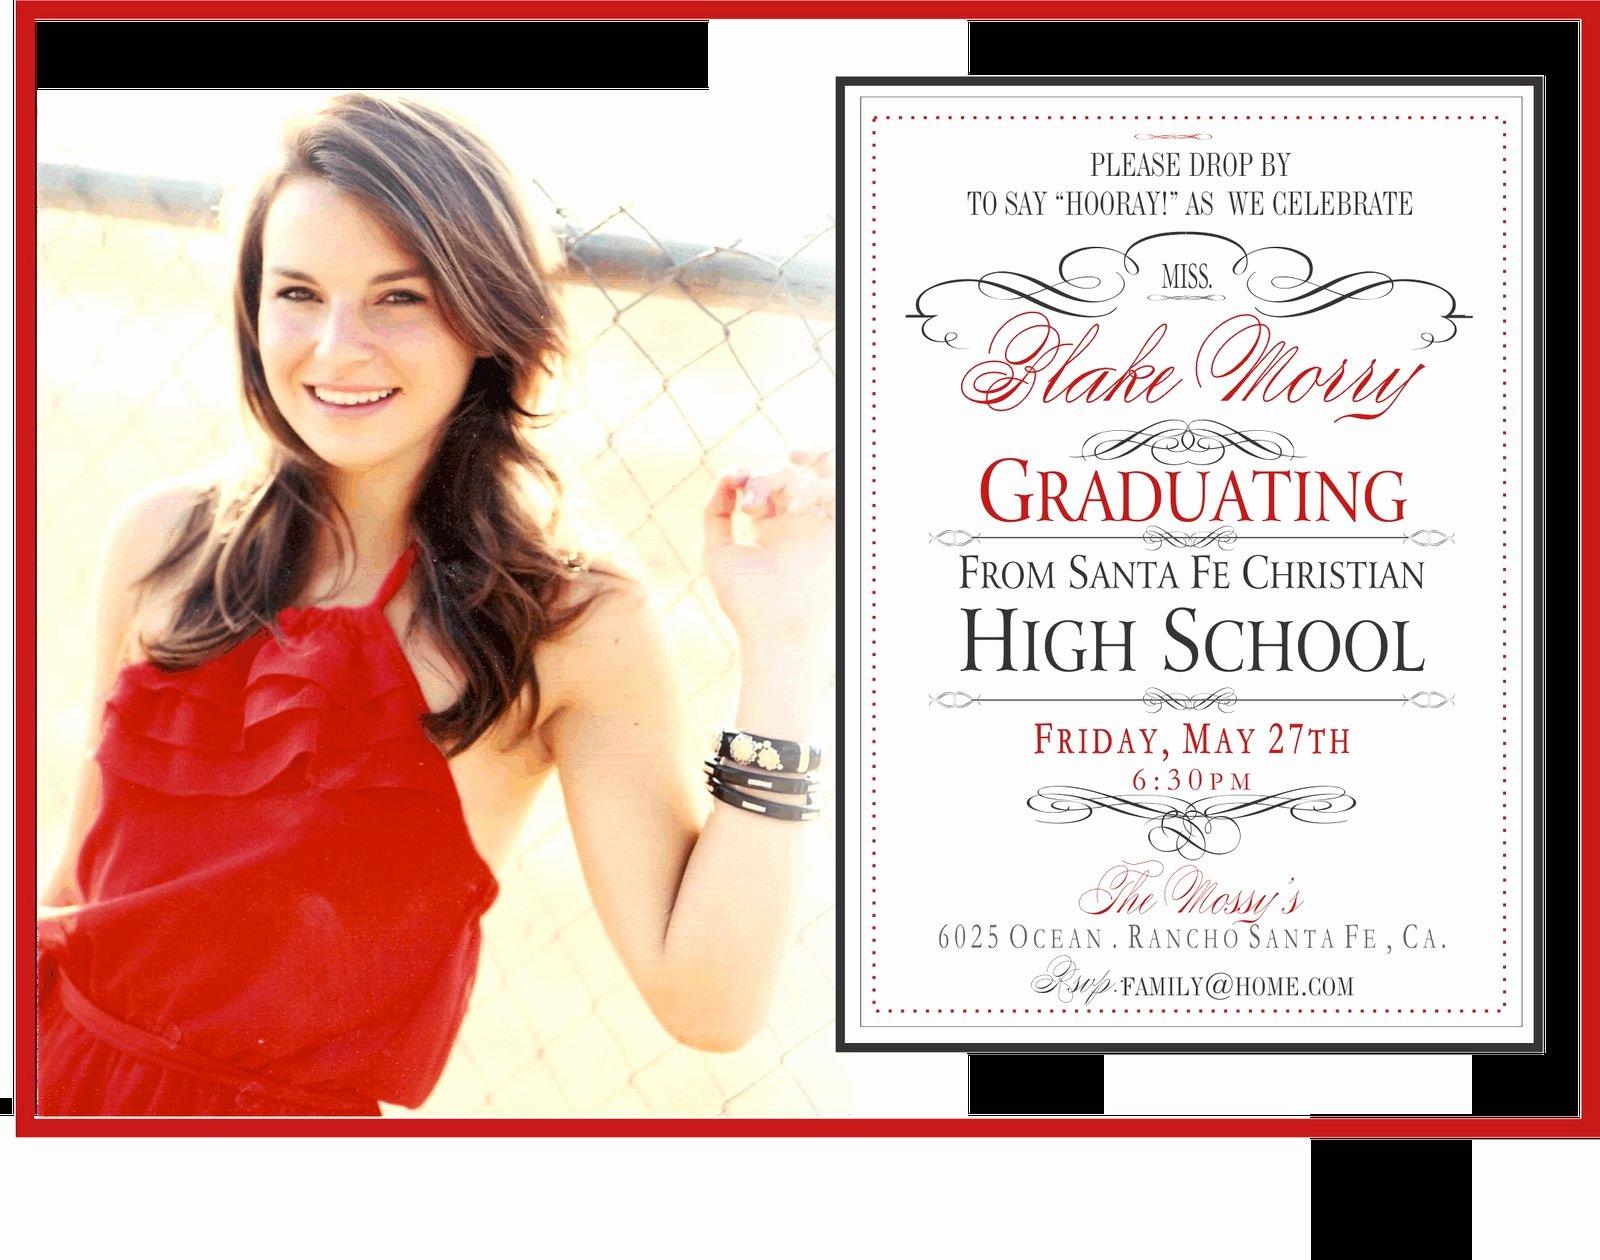 Graduation Invitation Templates Microsoft Word Luxury Graduation Party Invitation Template Graduation Party